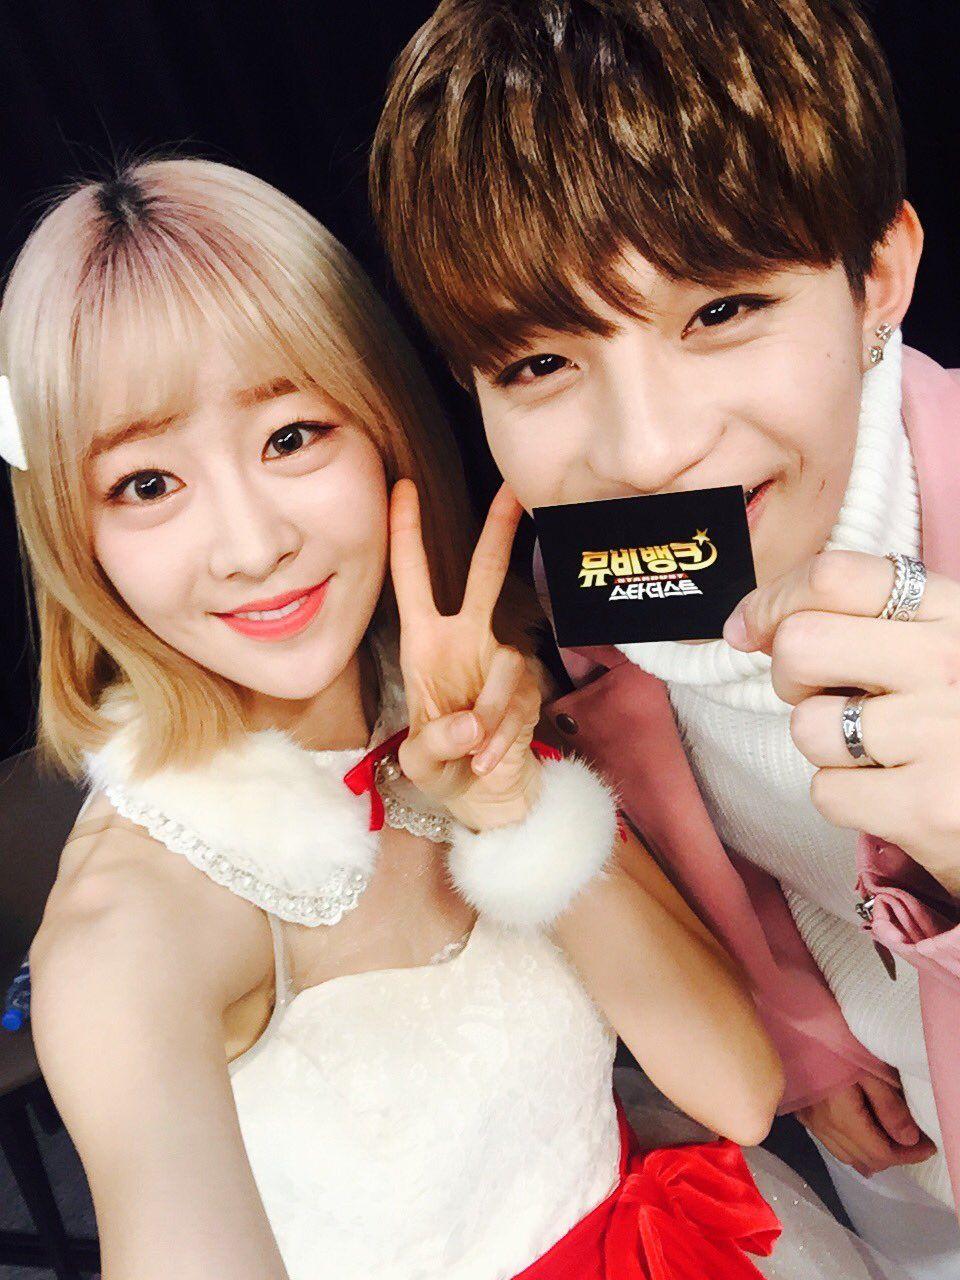 UP10TION Jinhoo & laboom - KBS STardust MC #UP10TION #업텐션 #Jinhoo #진후